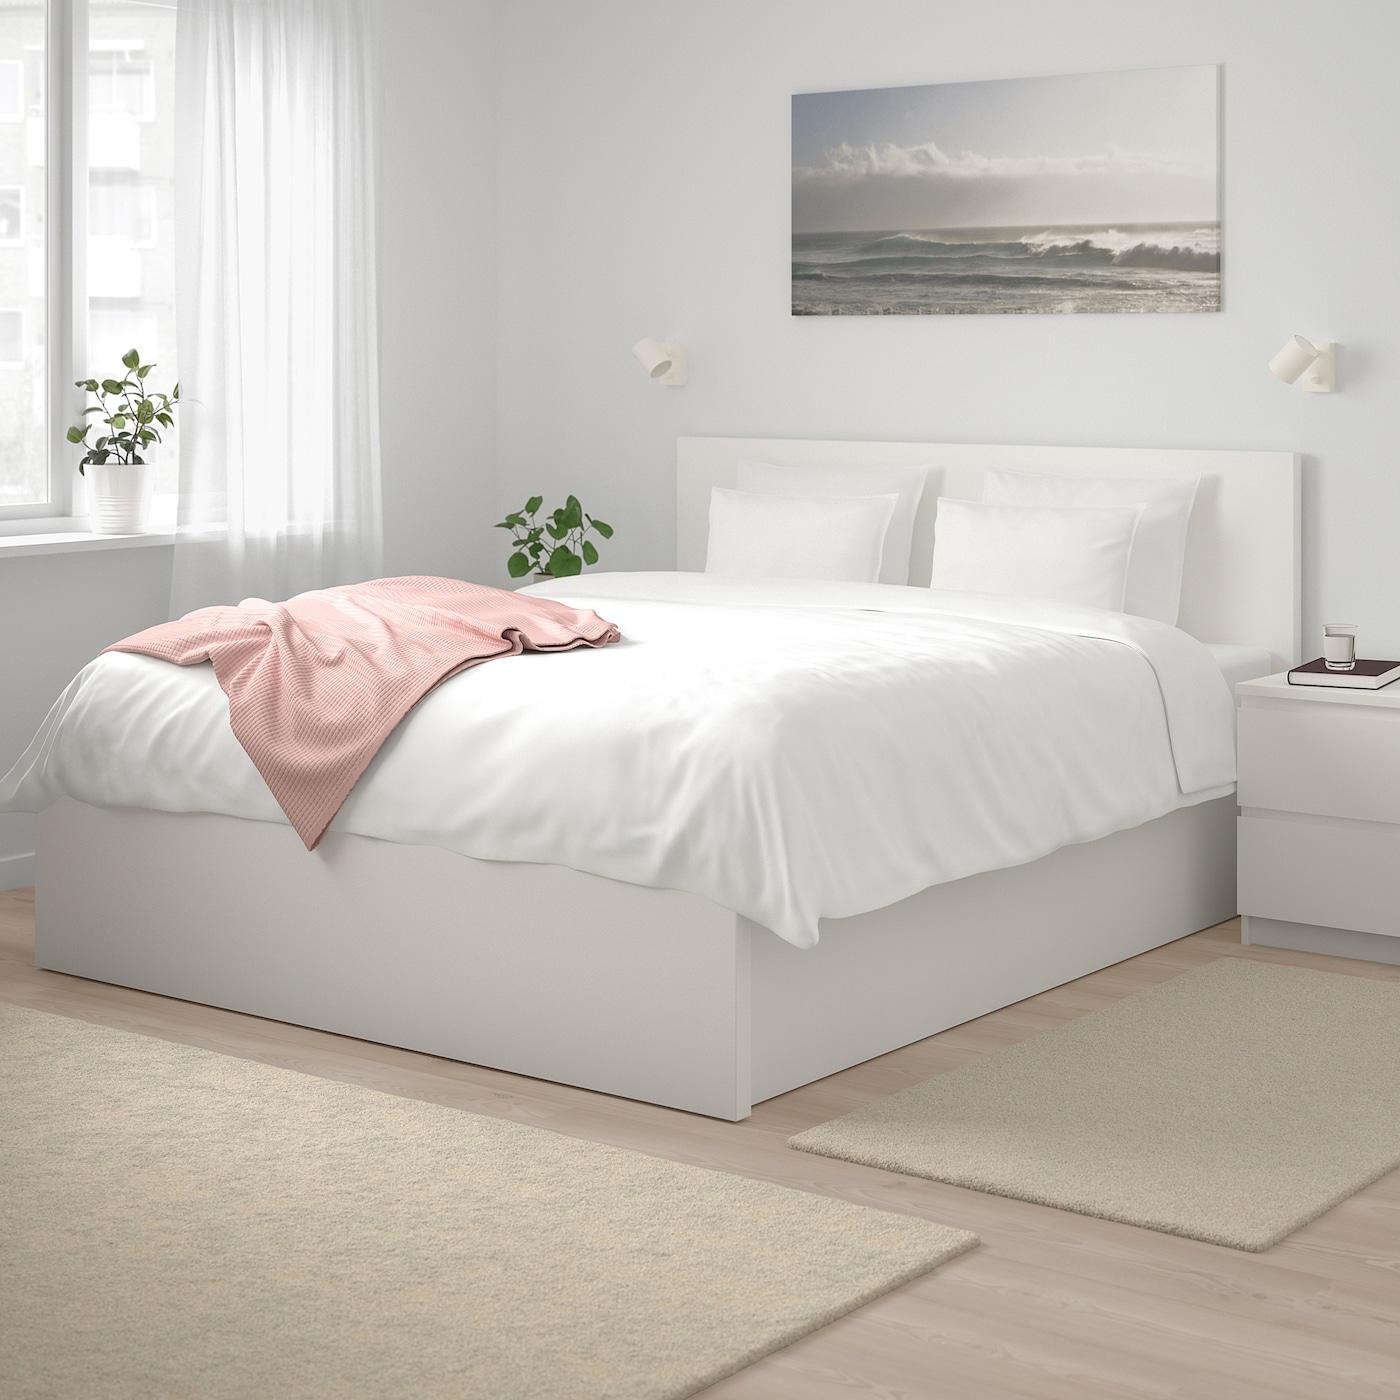 MALM Ottoman bed - white 5x5 cm